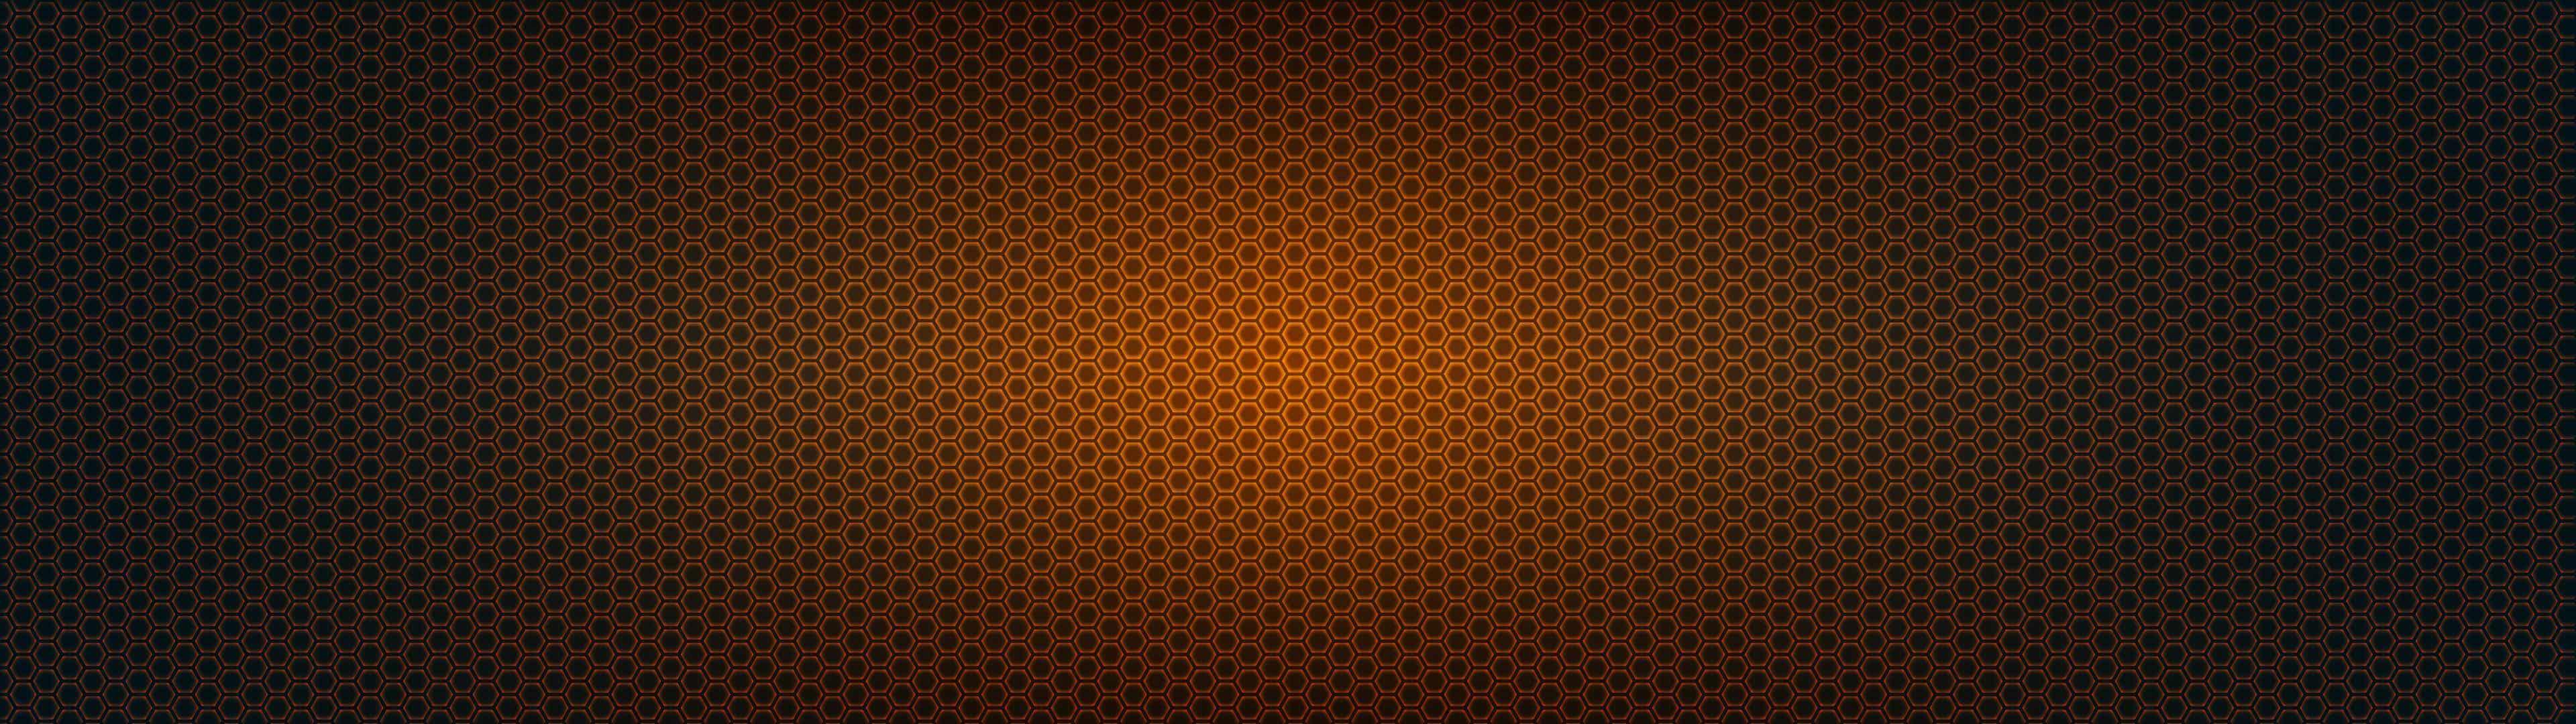 hexagon pattern orange and black dual monitor wallpaper